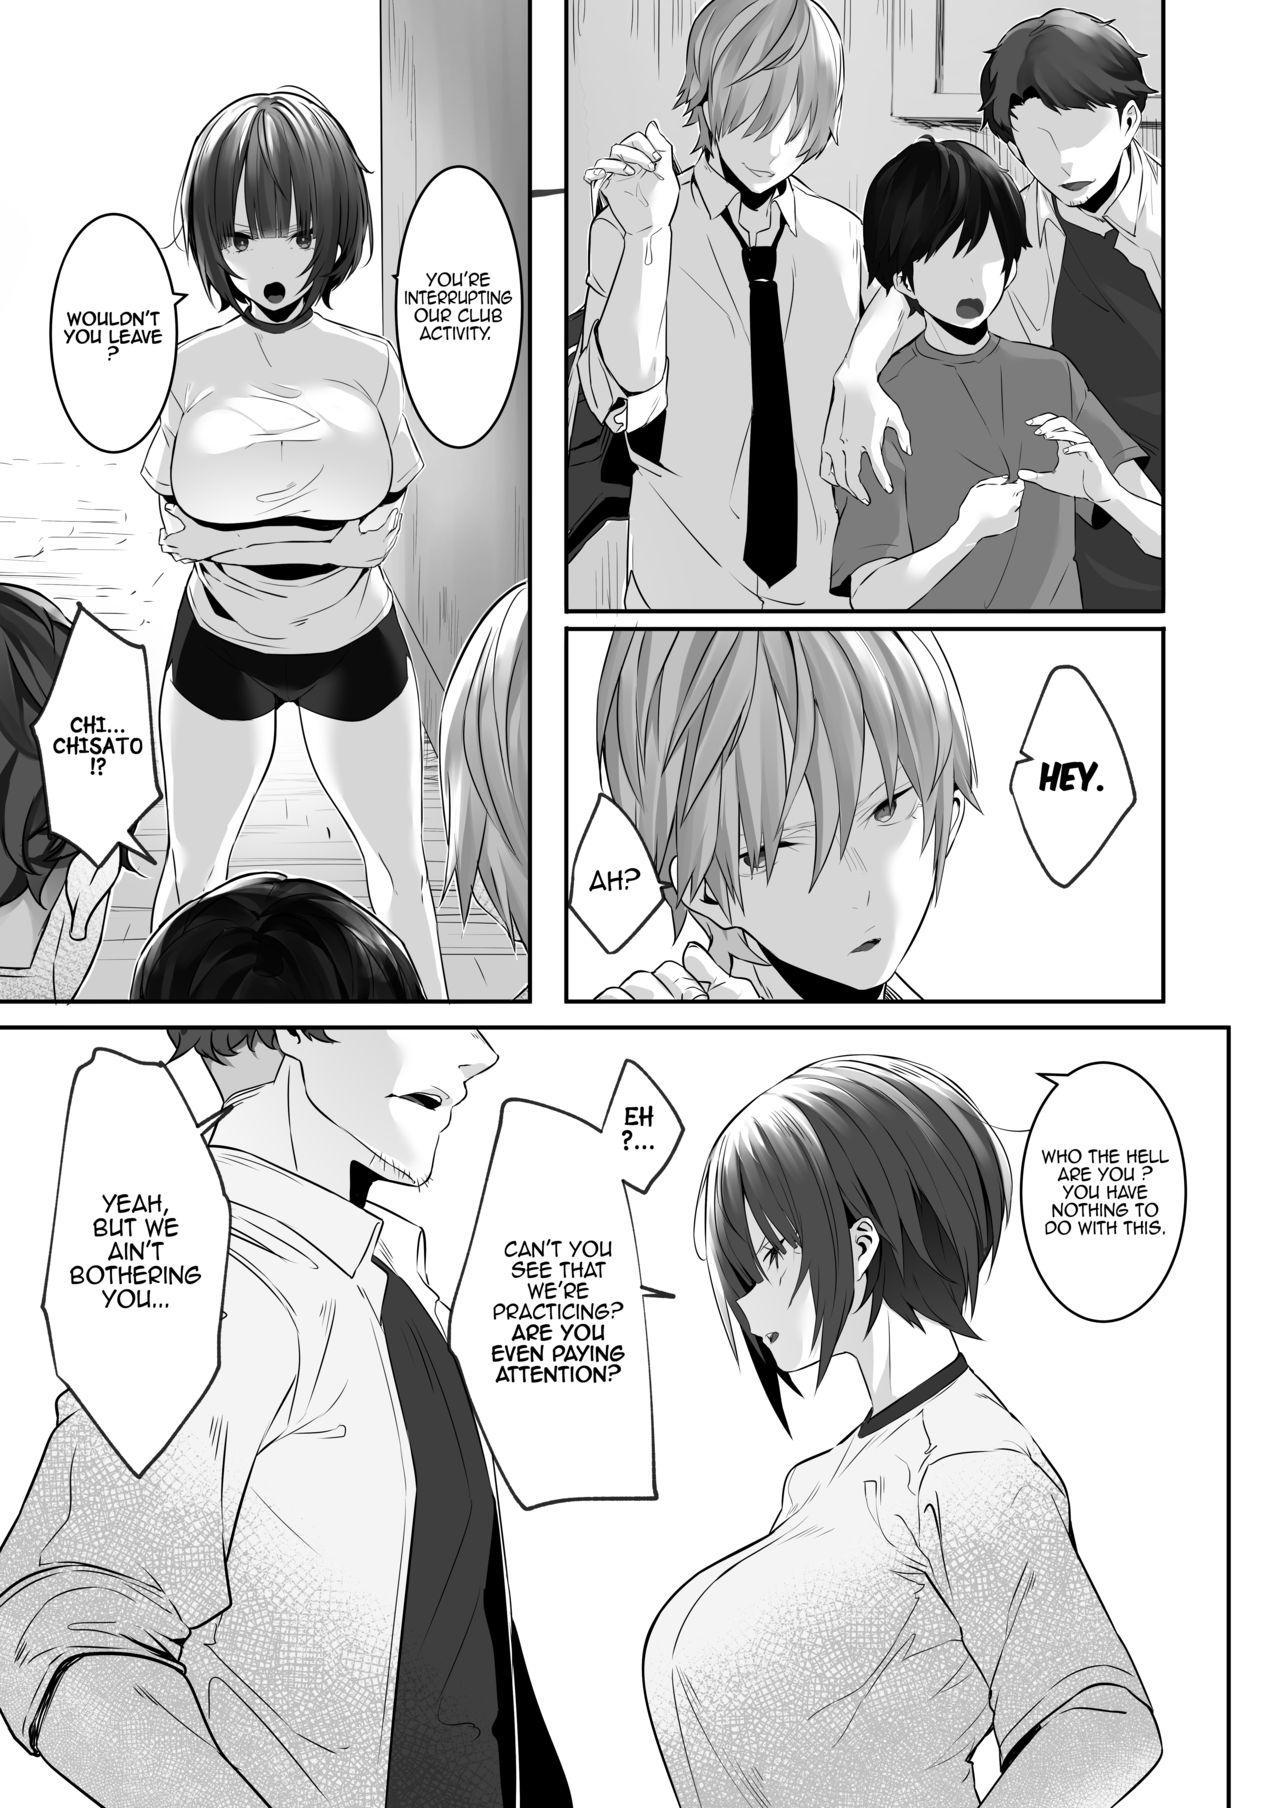 Tsuyoki na Undoubu Joshi ga Netorareru | Having Cheating Sex wih the Strong-minded Girl from the School's Athletic Club 3